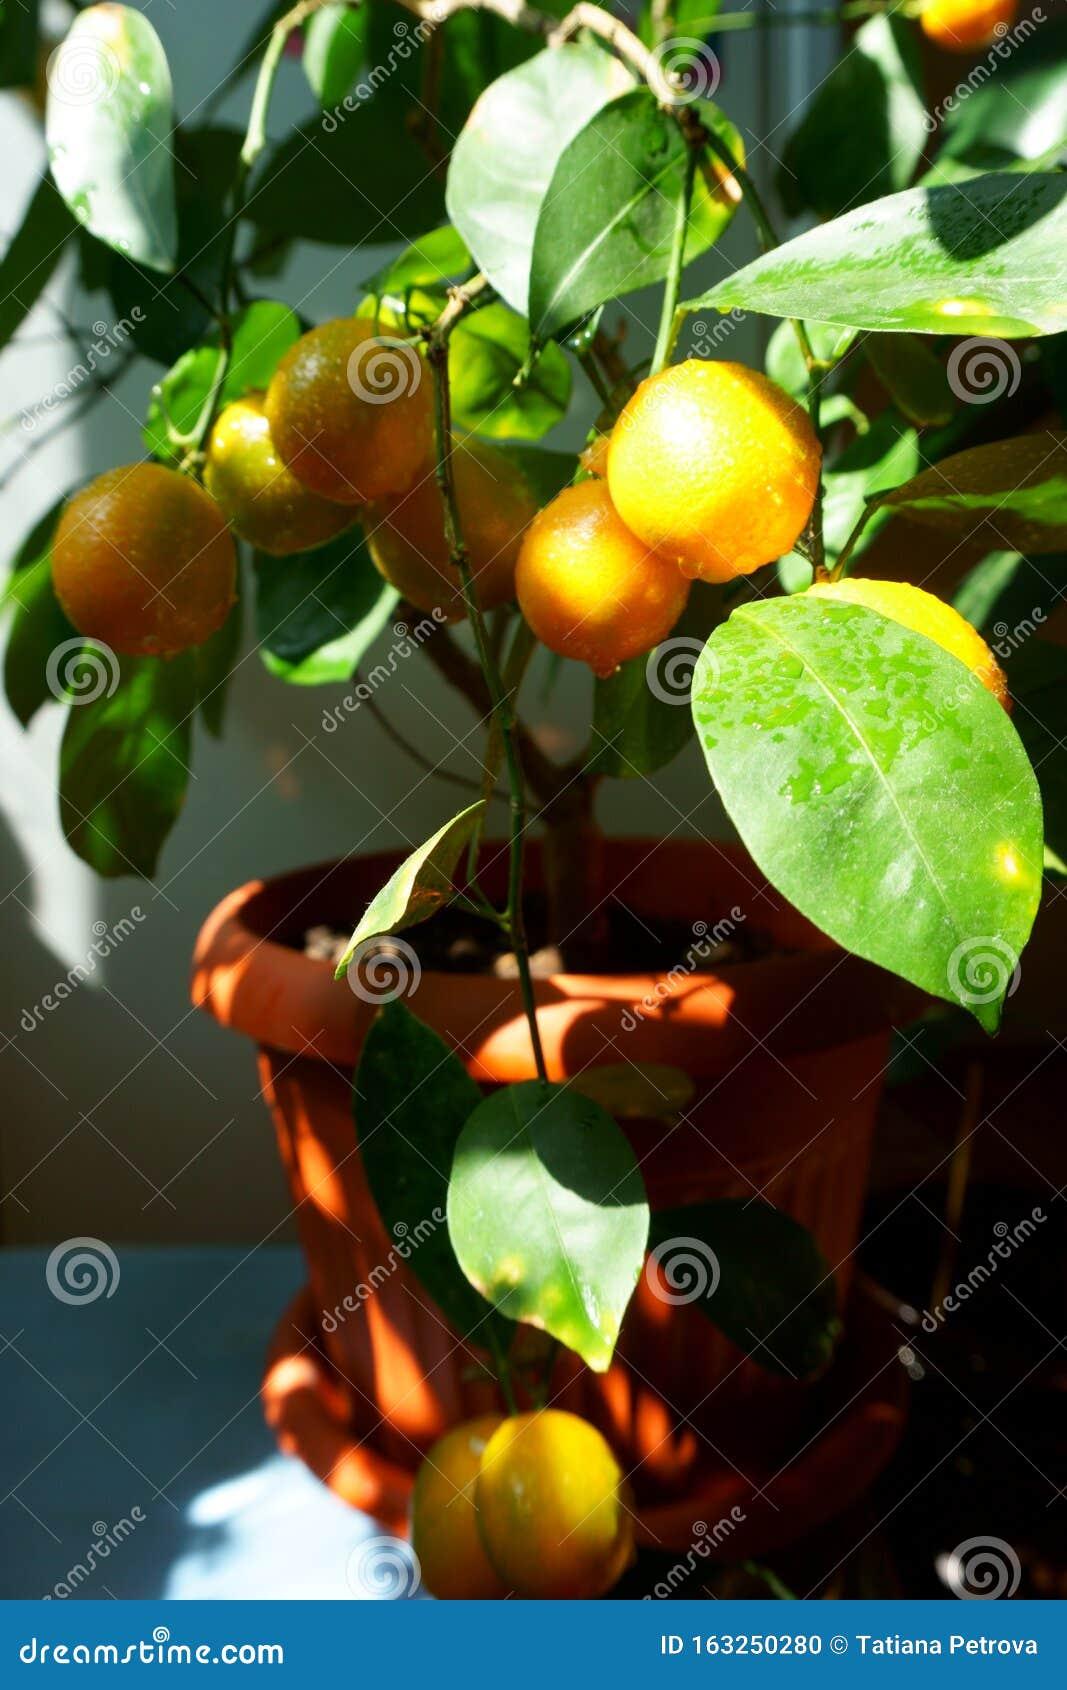 Edible Fruit Mandarin Bonsai Tree Citrus Bonsai Stock Photo Image Of Lemon Small 163250280